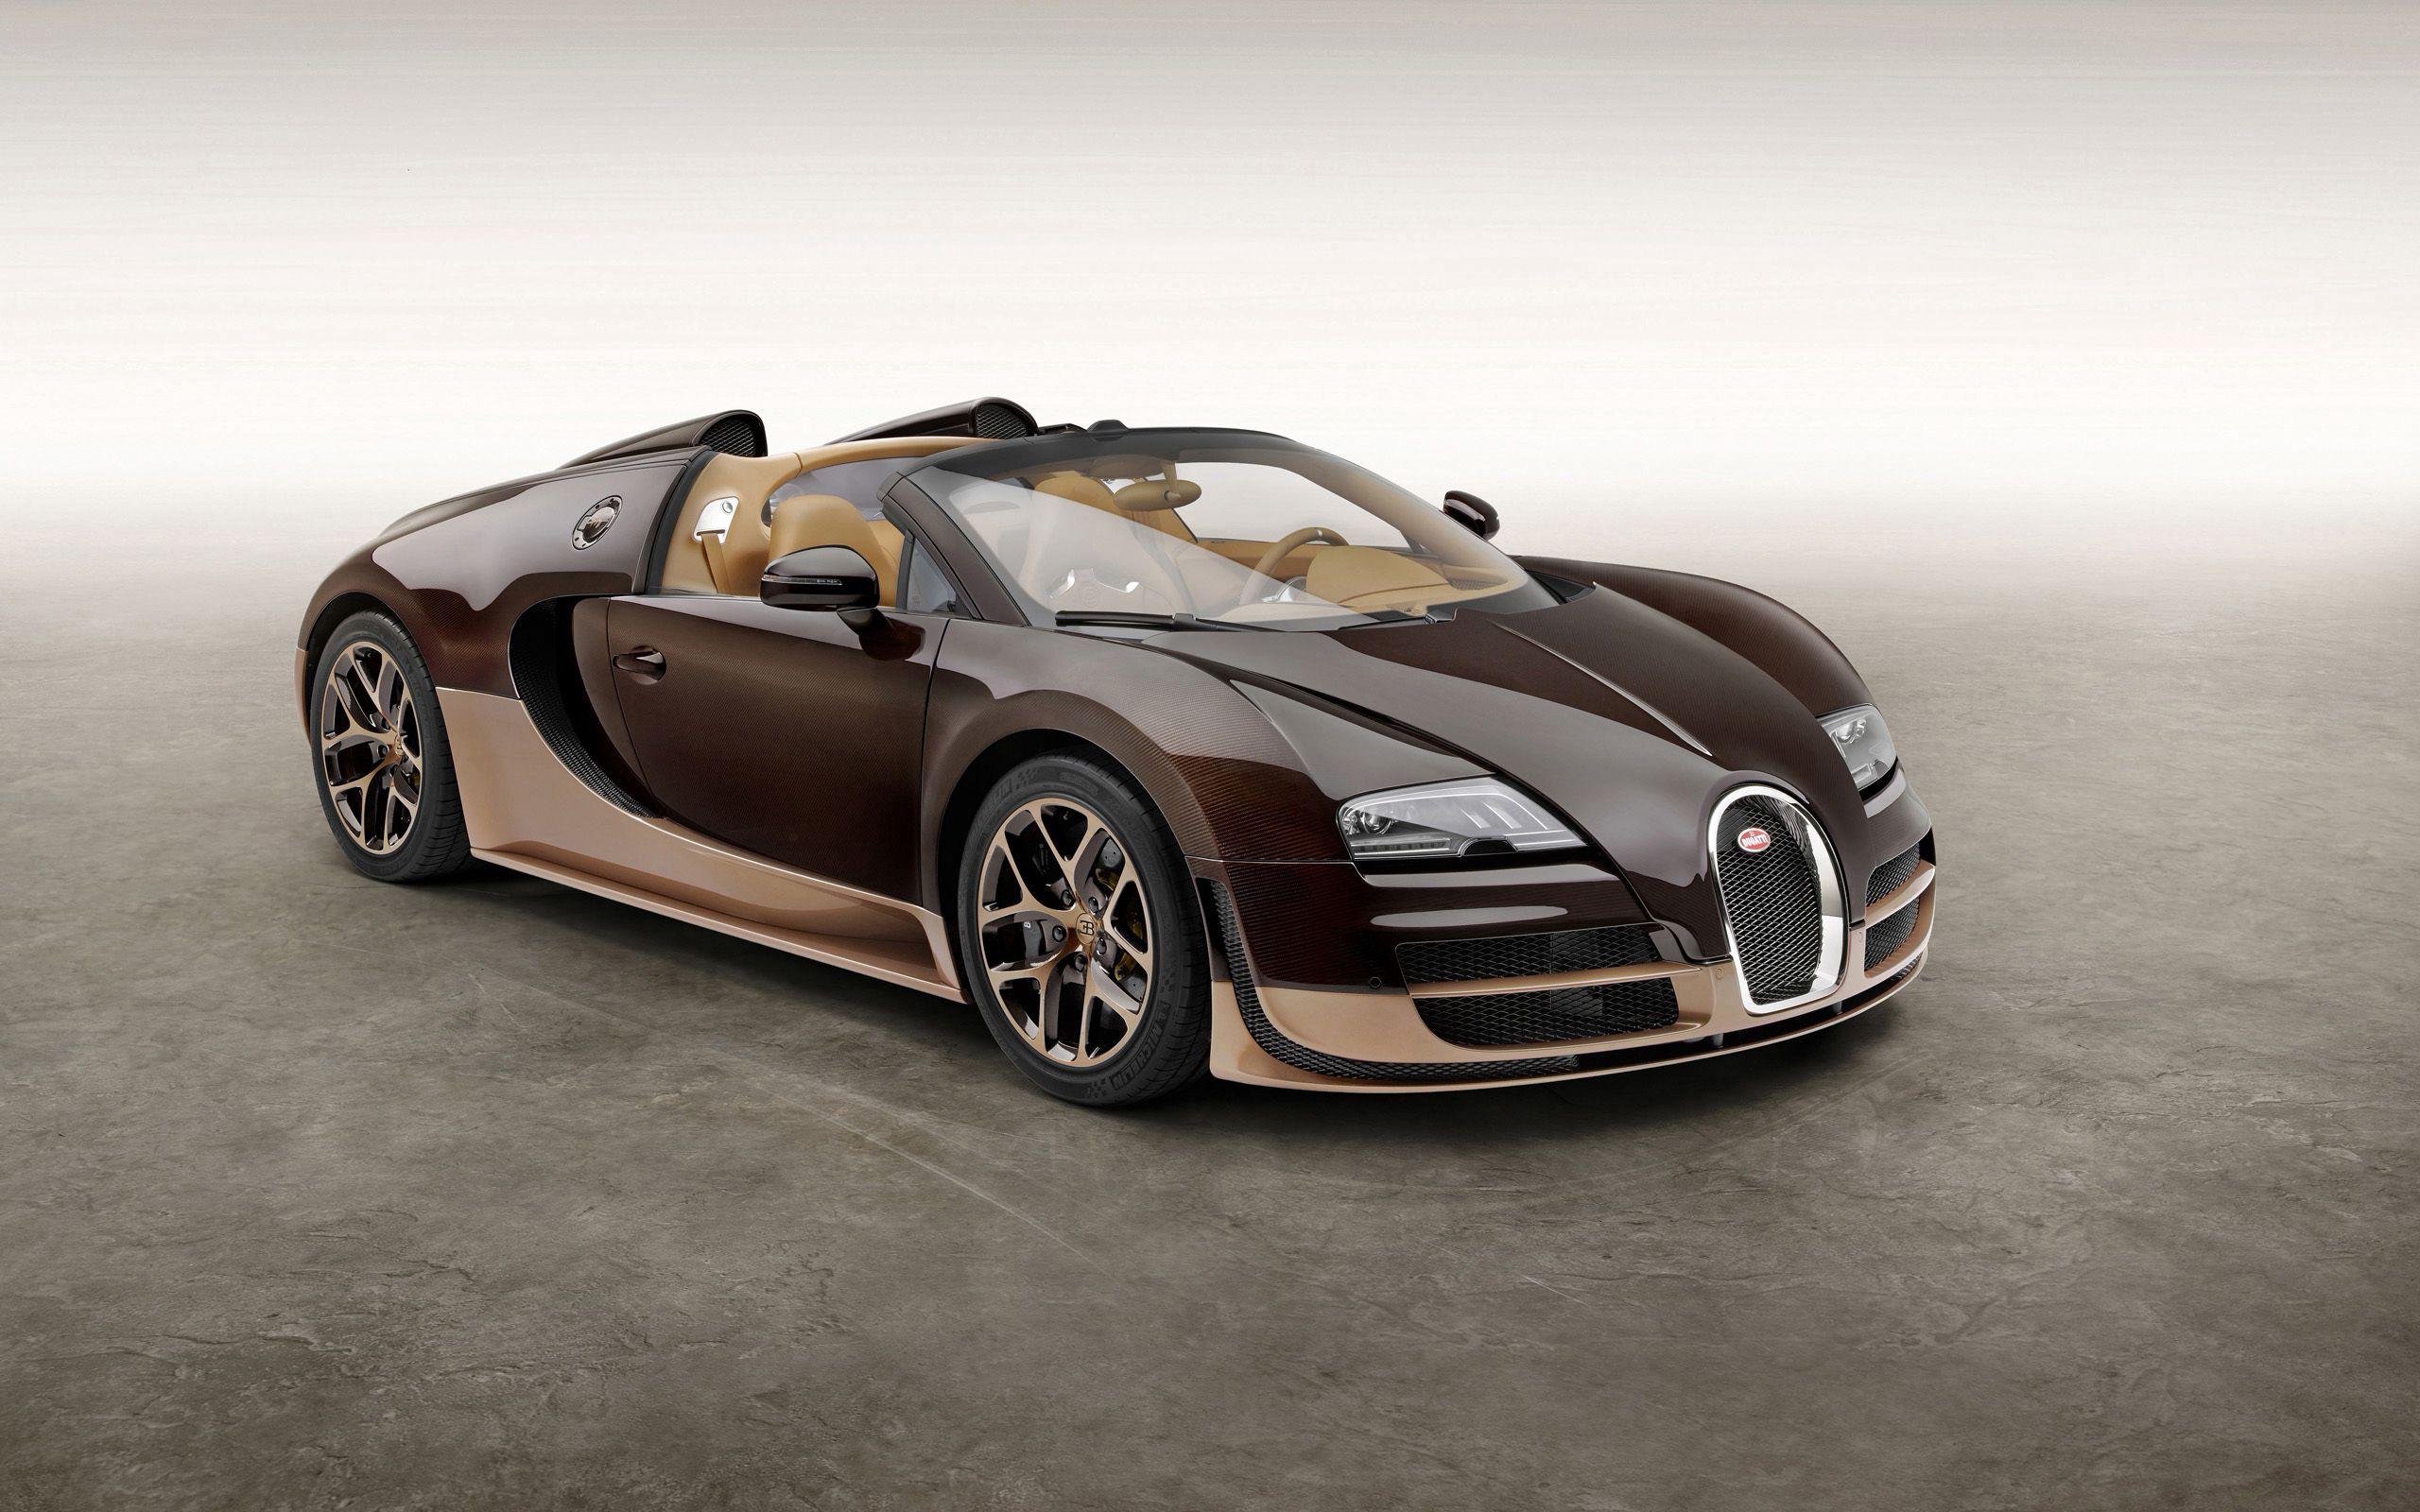 130800 скачать обои Тачки (Cars), Bugatti Veyron, Bugatti Rembrandt, Grand Sport Vitesse Bugatti Veyron - заставки и картинки бесплатно